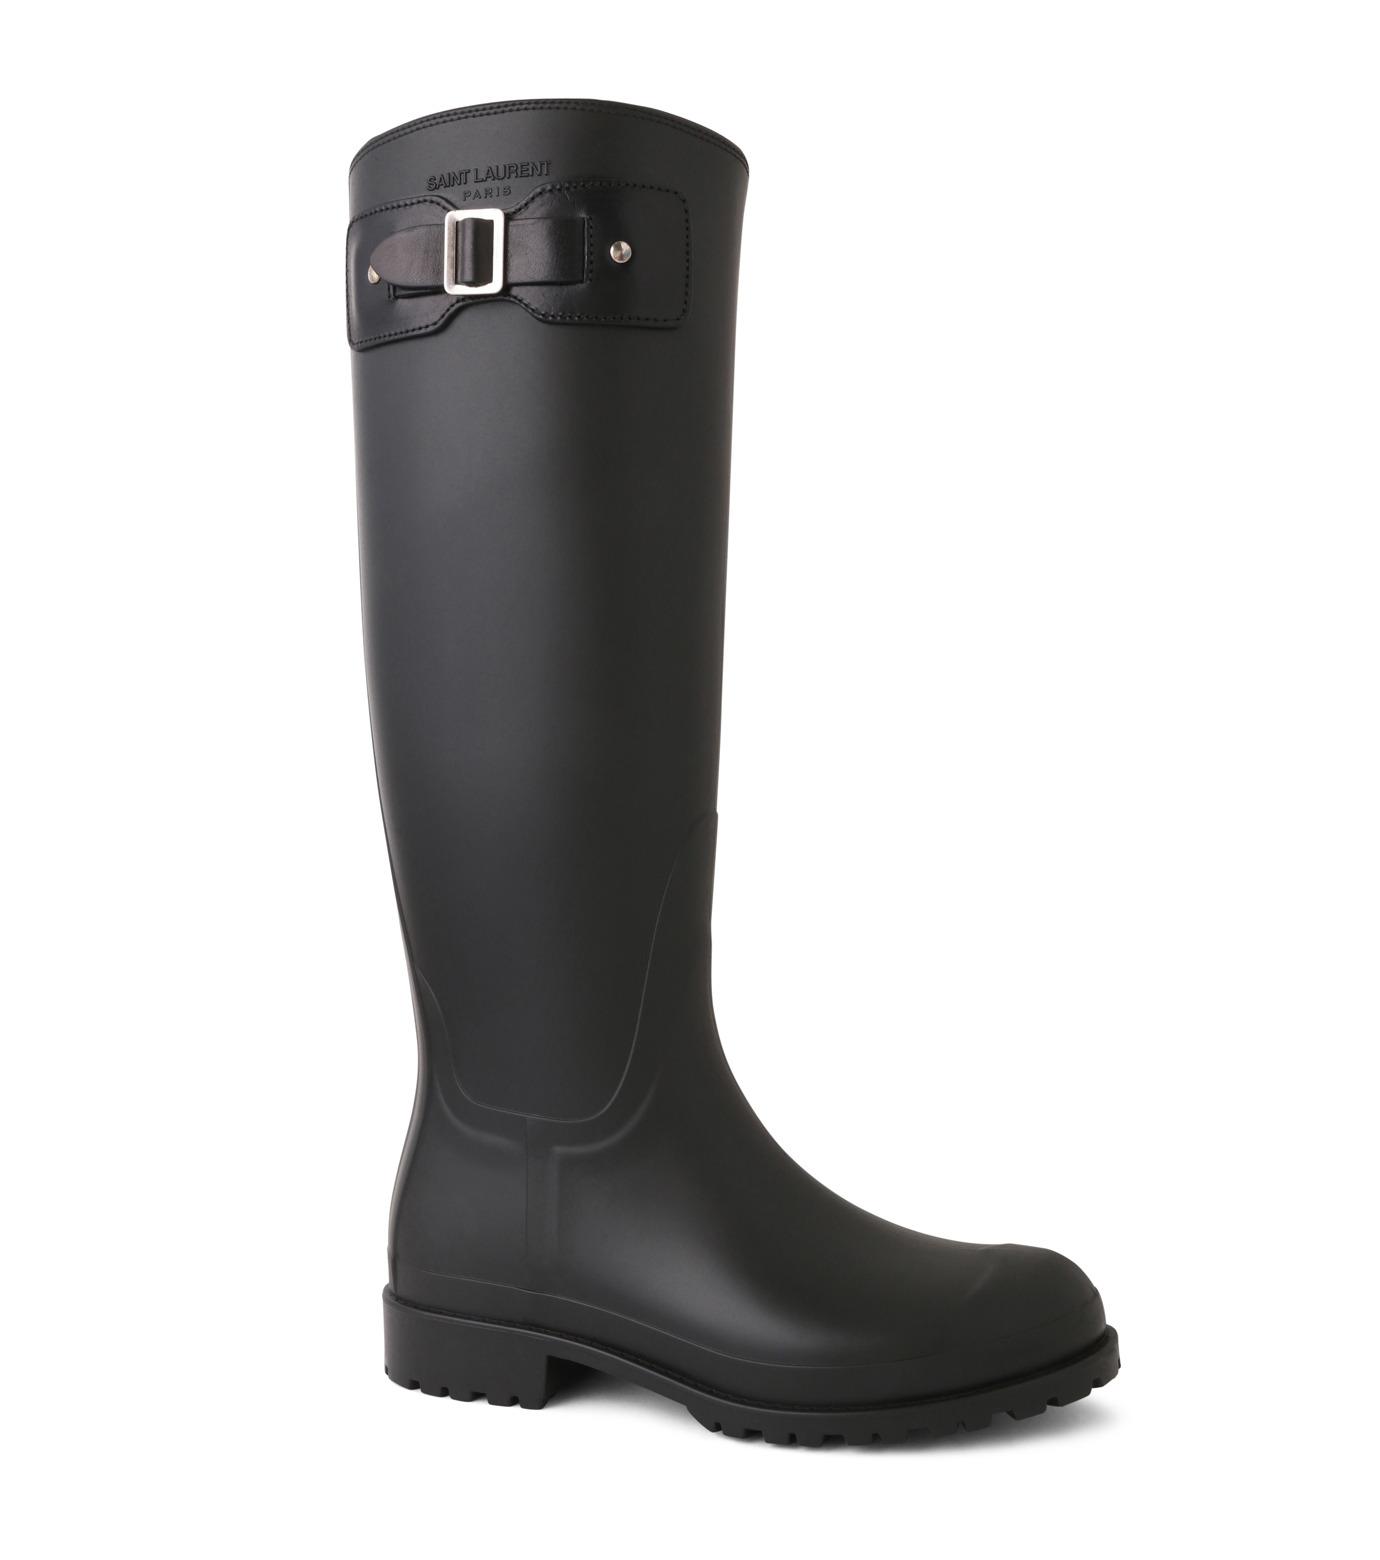 SAINT LAURENT(サンローラン)のRain Boots-BLACK(シューズ/shoes)-427315-GQN10-13 拡大詳細画像1